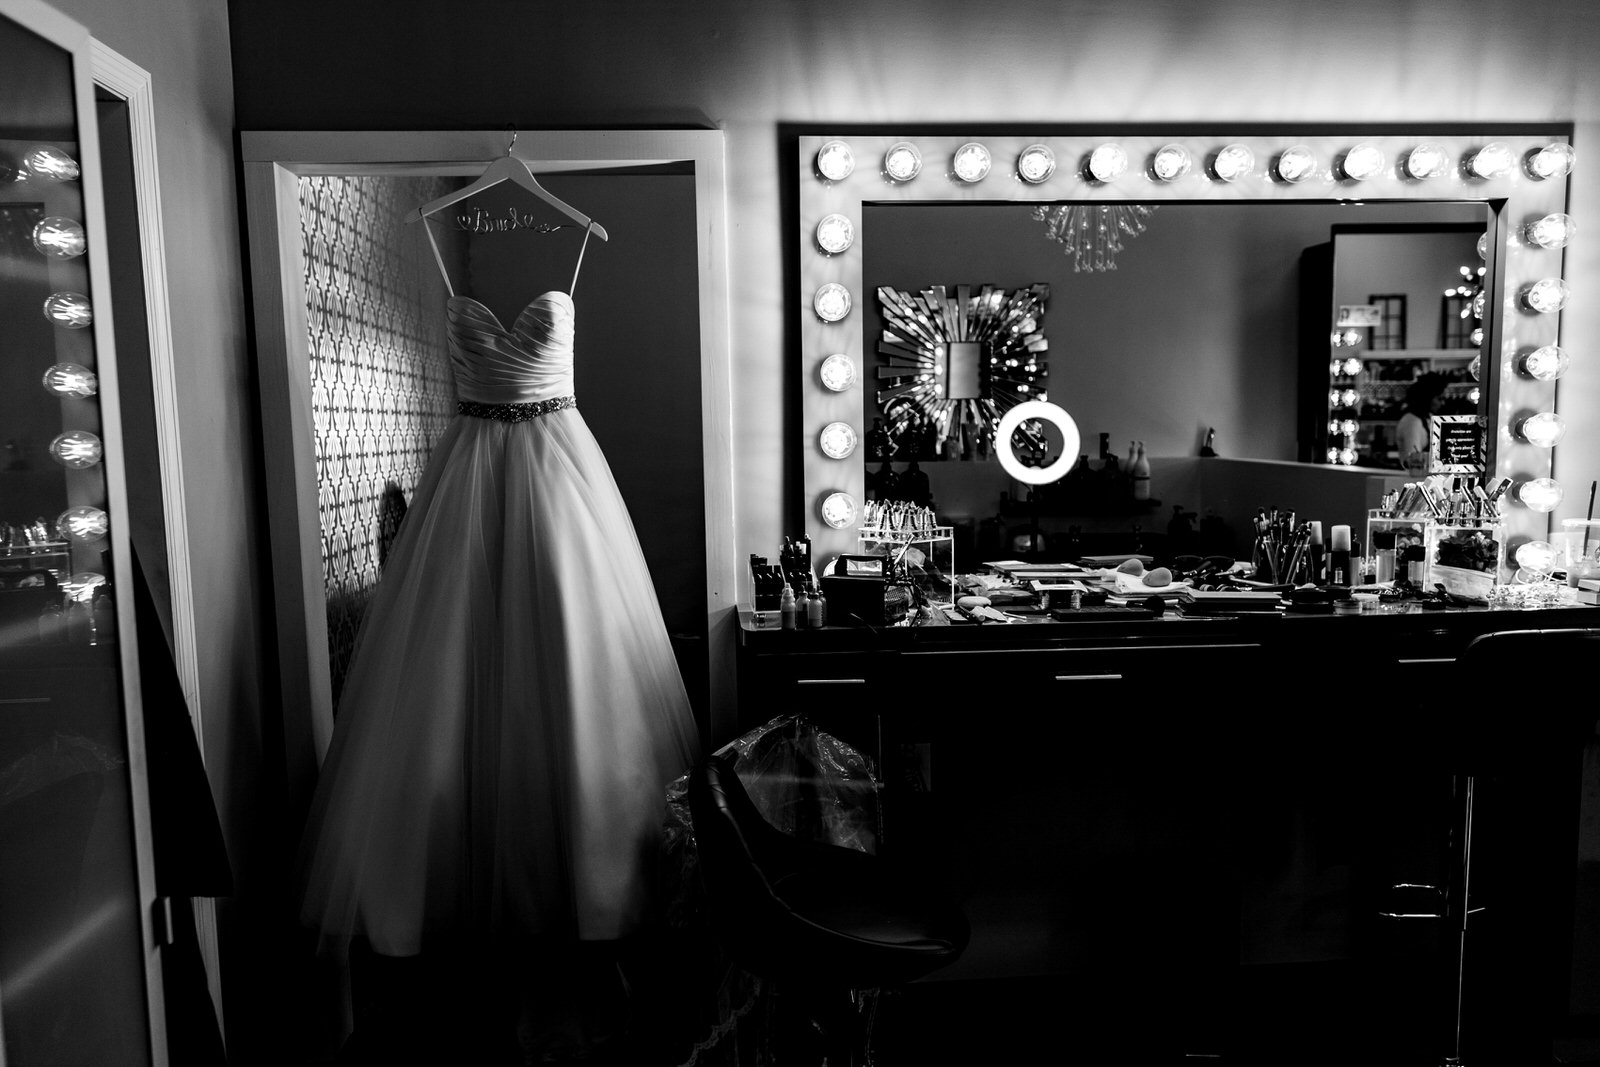 getting_ready_salon_wedding_day_stuart_wedding_photographer-3.jpg